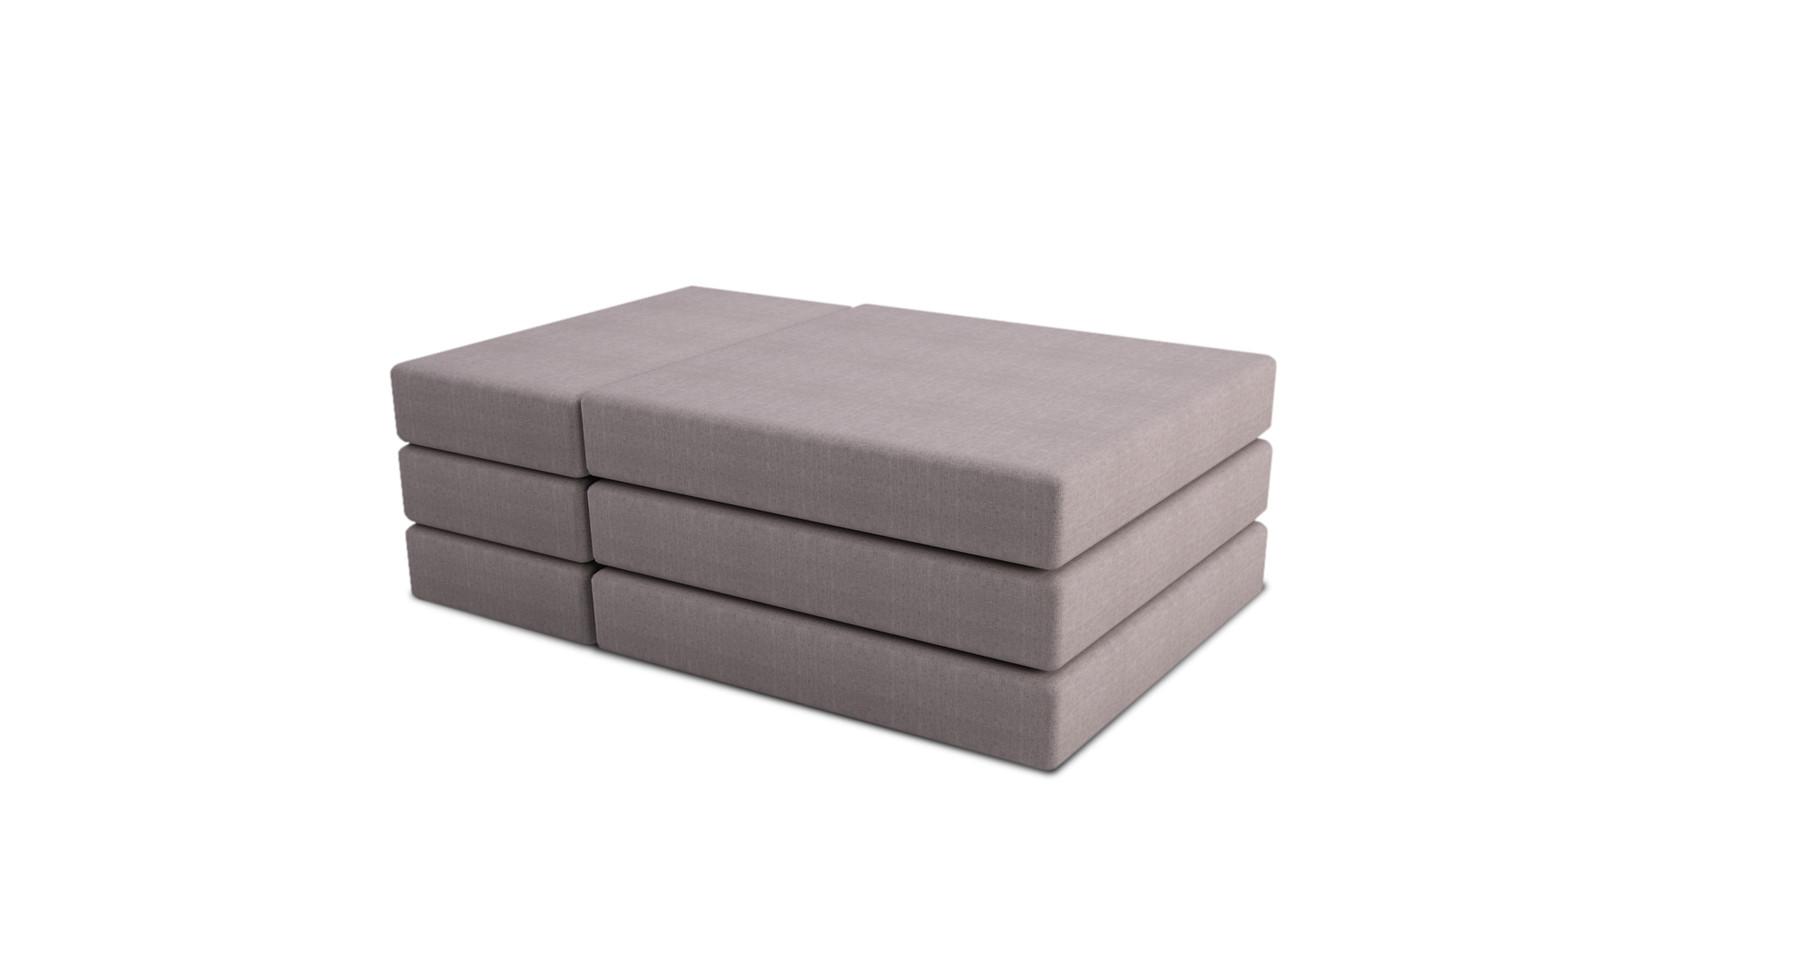 Dodeka- Premise cushions storage